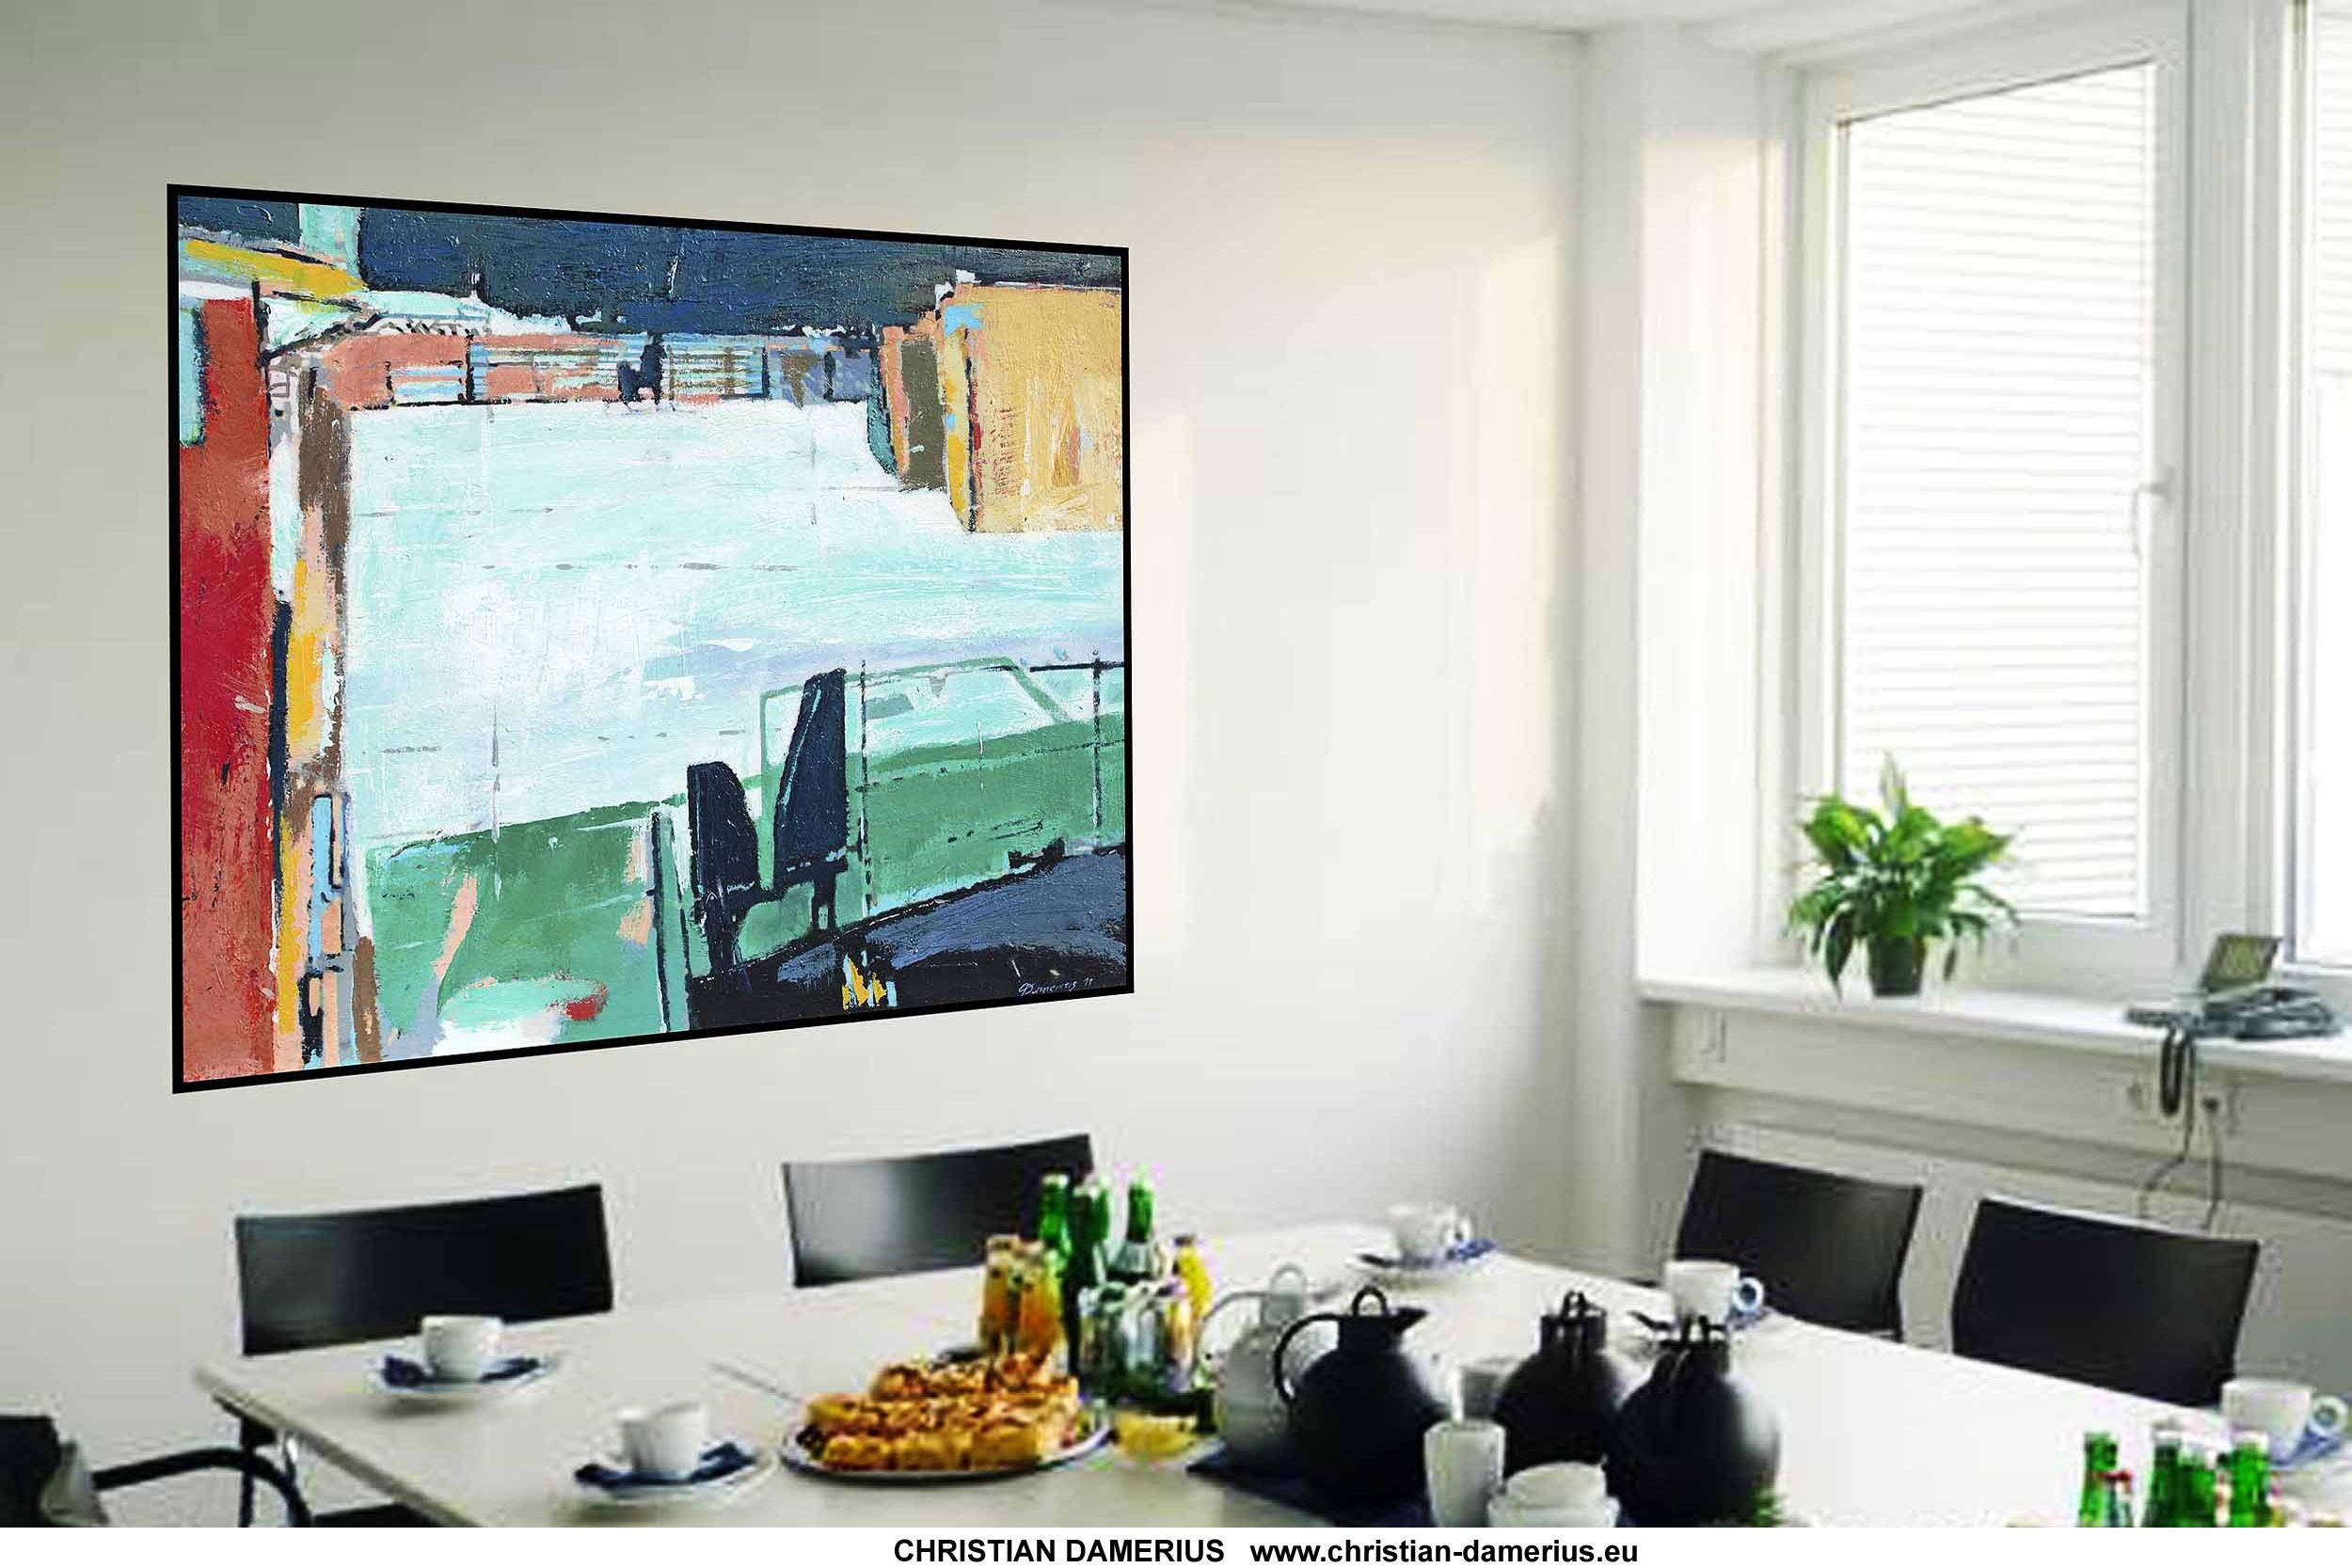 Acrylbilder Hamburg moderne raumgestaltung wandgestaltung kunst für büroräume